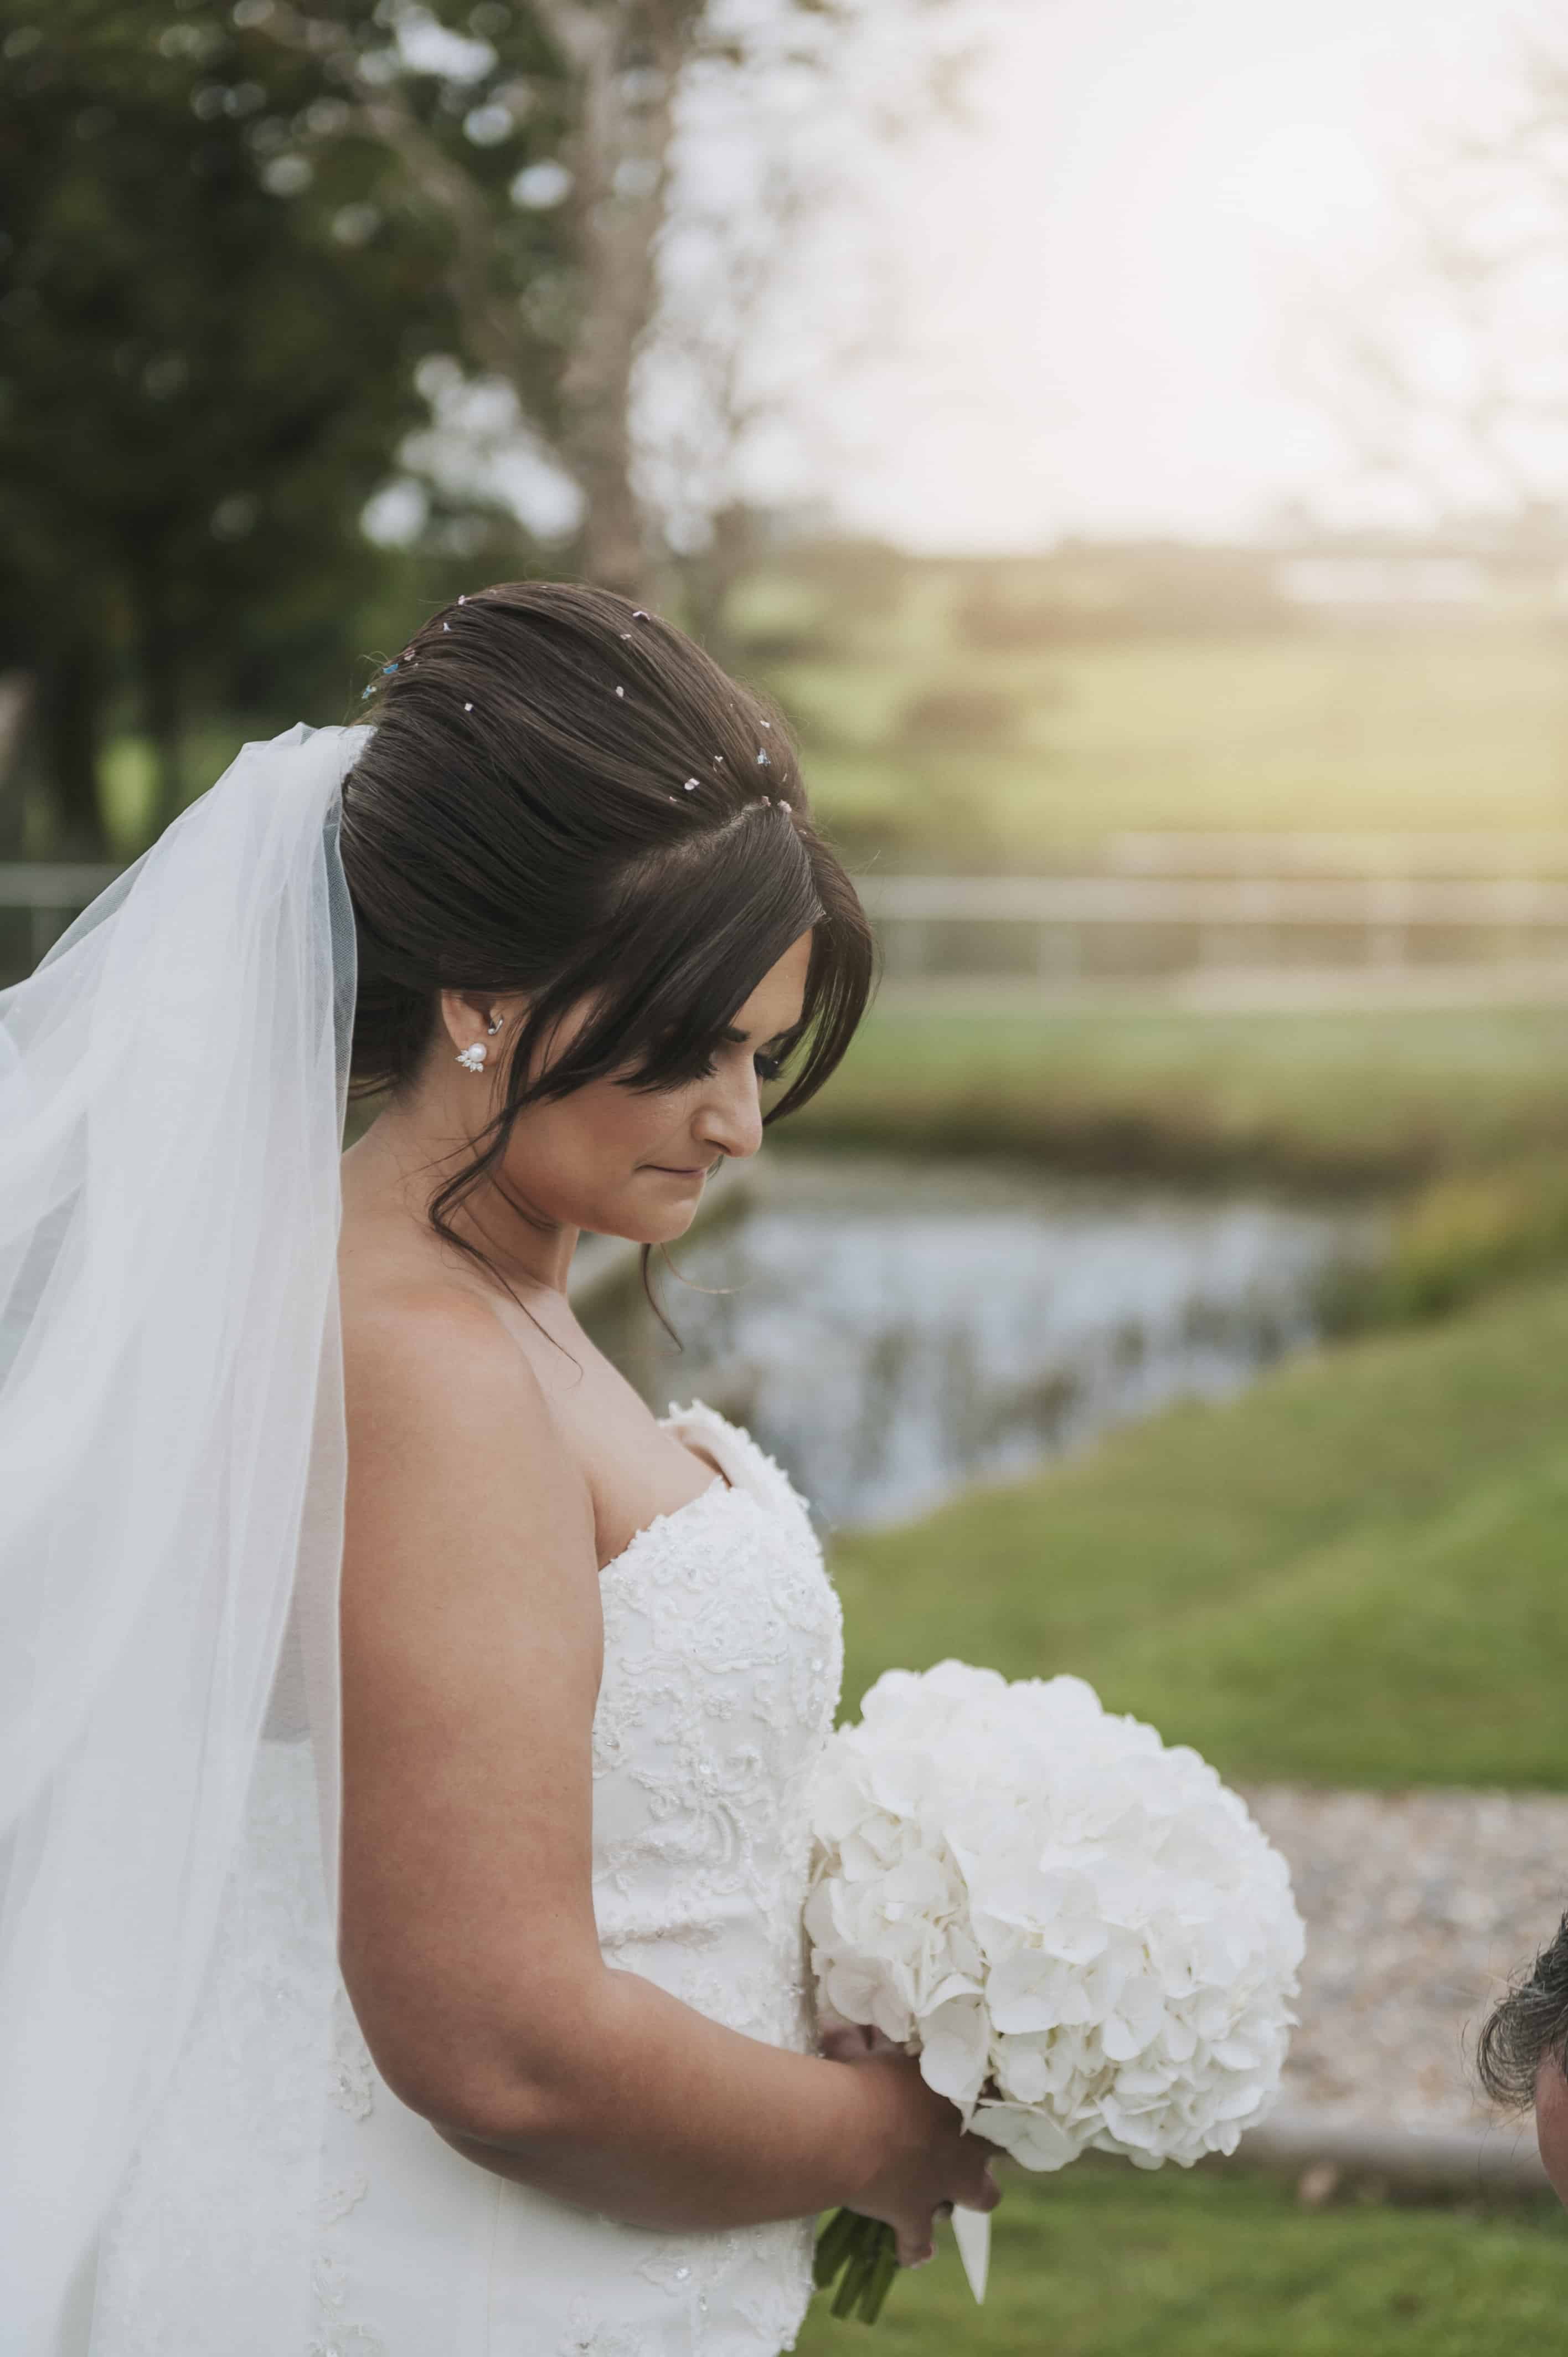 Bride holding her bouquet looking down Oldwalls Wedding Photographer